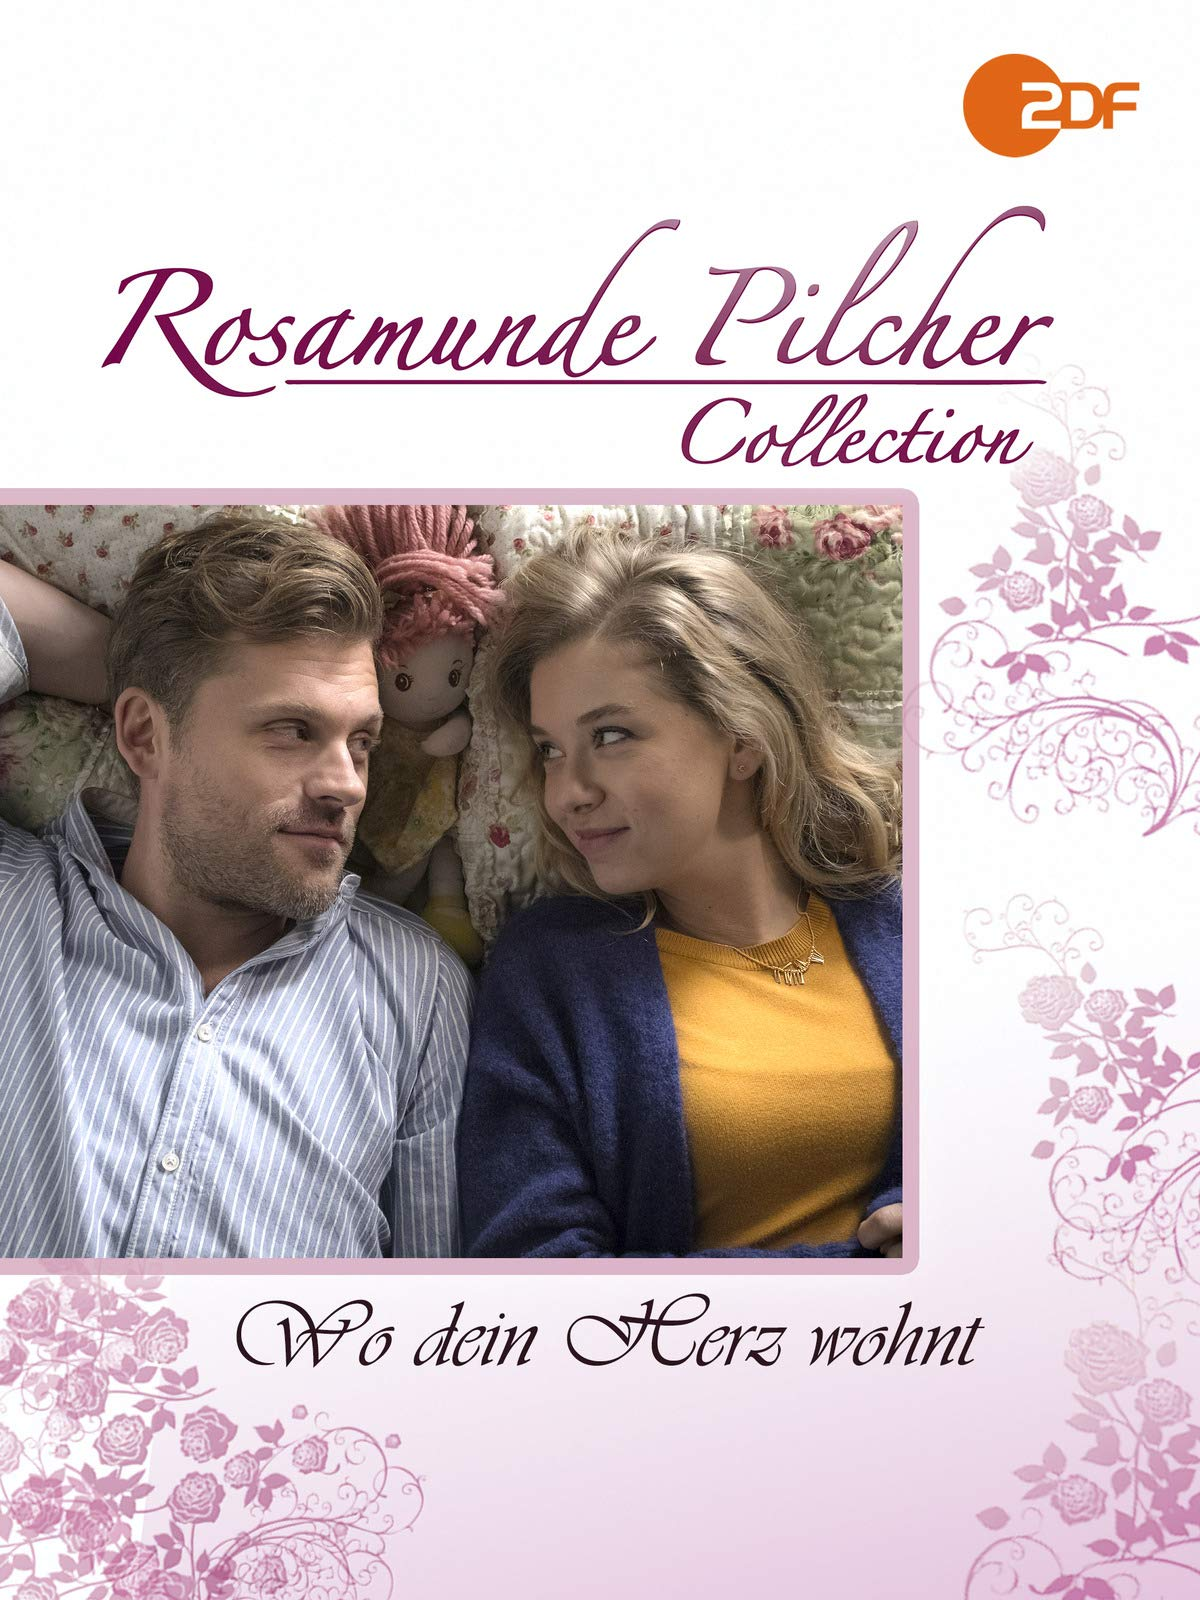 Wo Spielt Rosamunde Pilcher